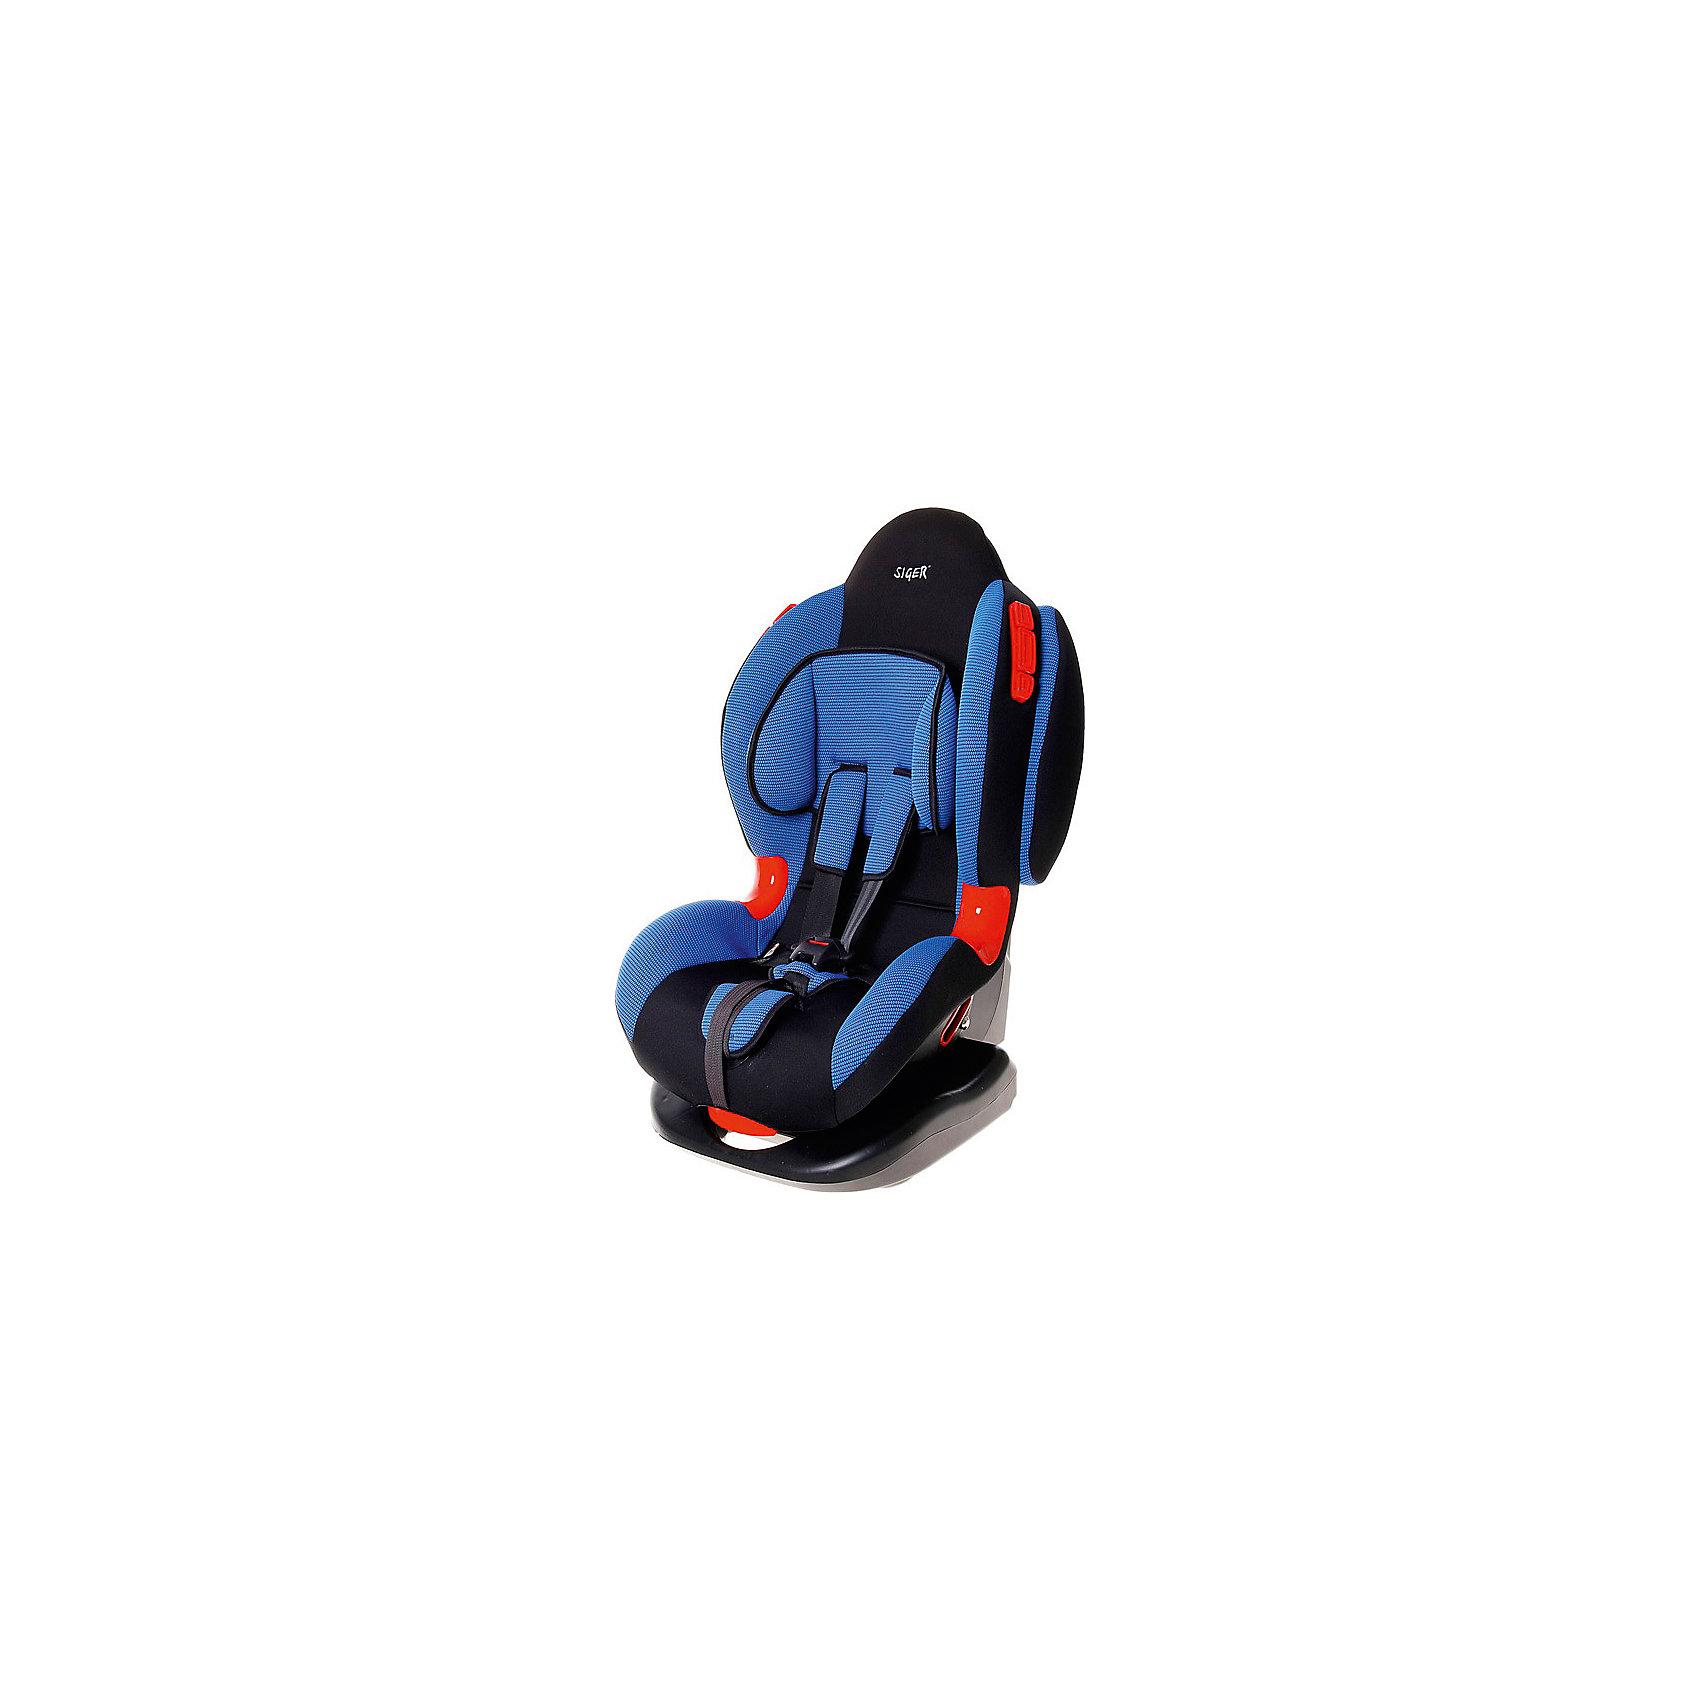 Автокресло Кокон, 9-25 кг., SIGER, синий